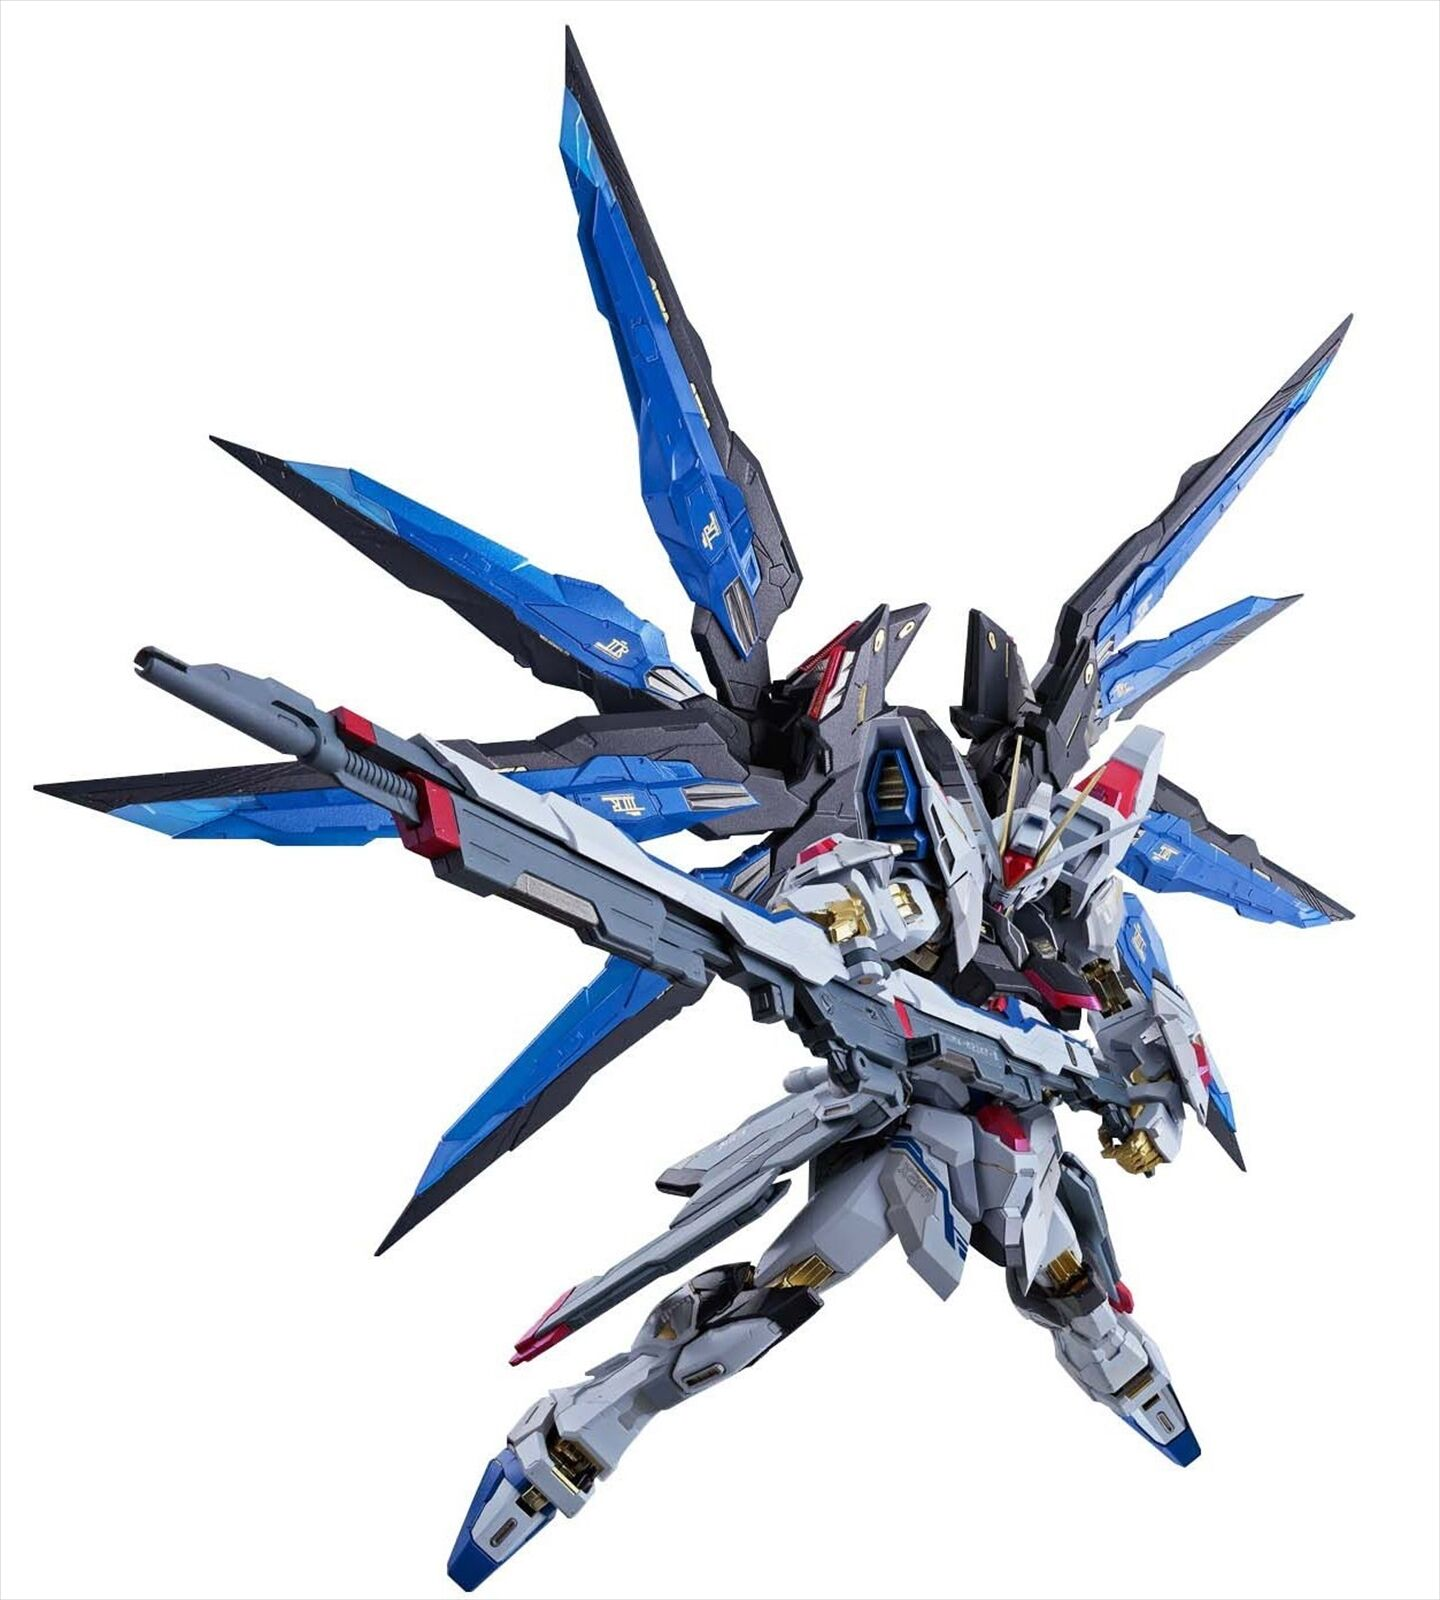 Bandai Tamashii Nations Strike Freedom Gundam Gundam Seed Figura De Acción